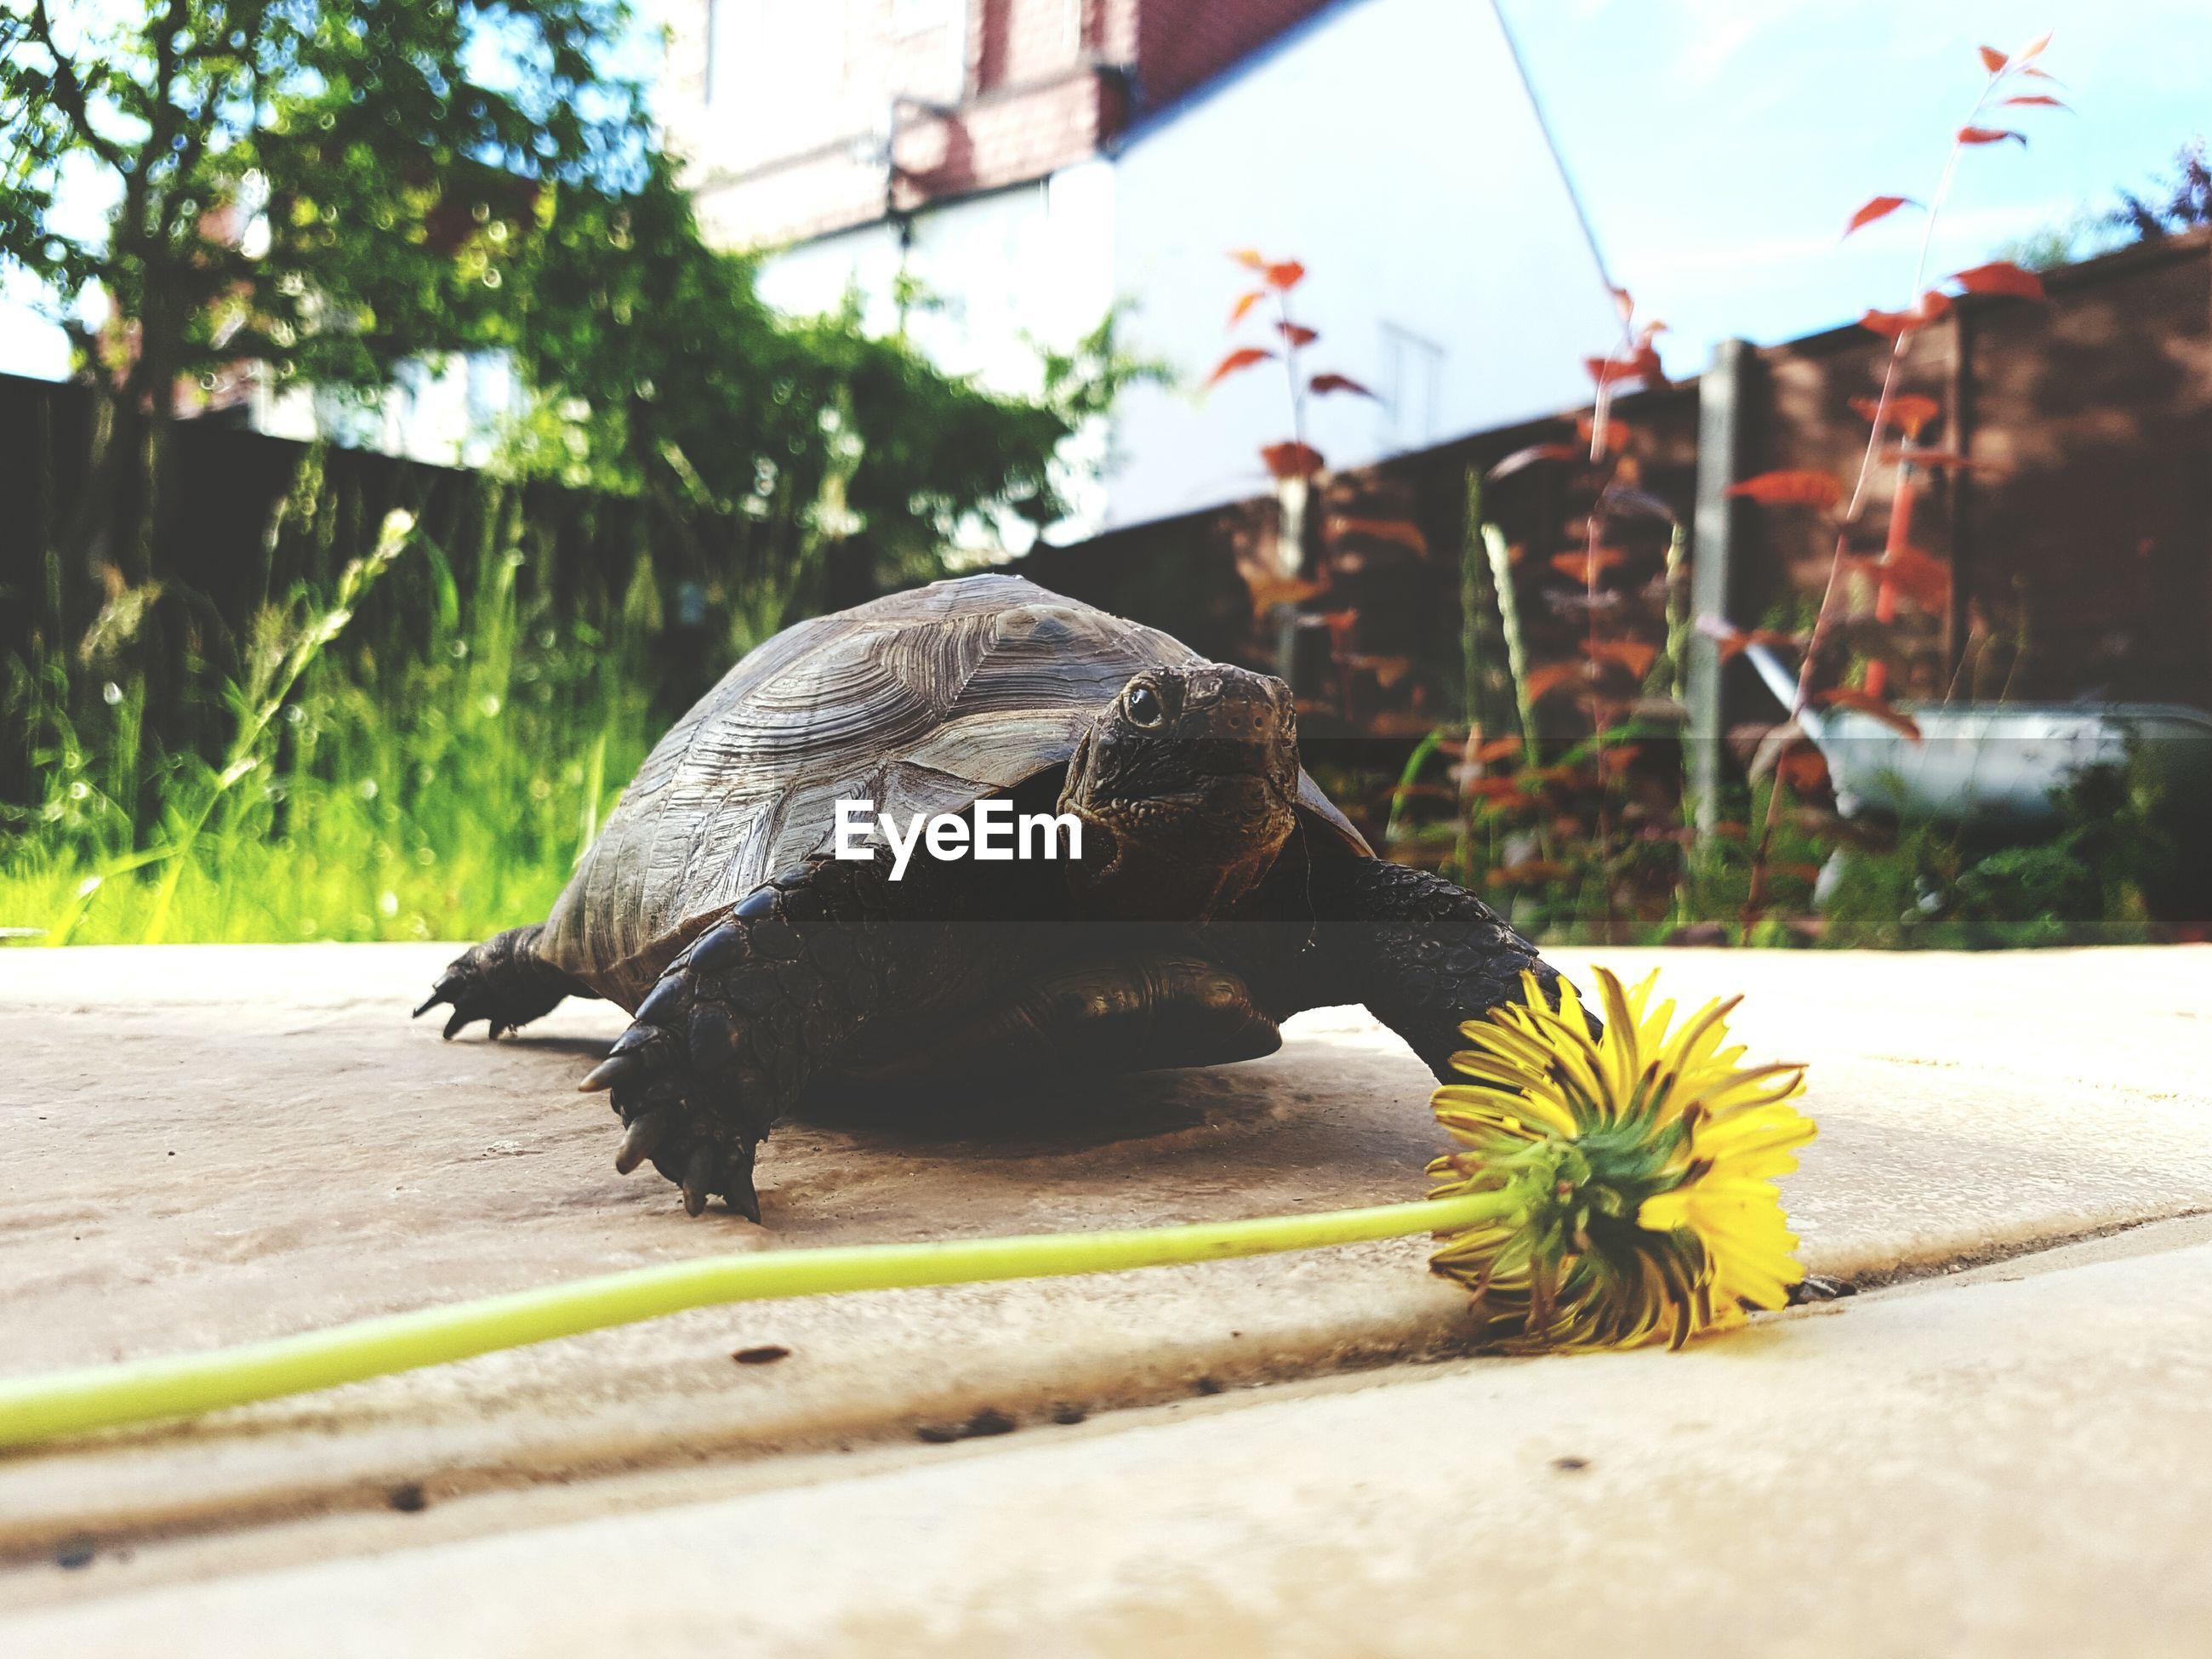 Tortoise reaching flower to feed